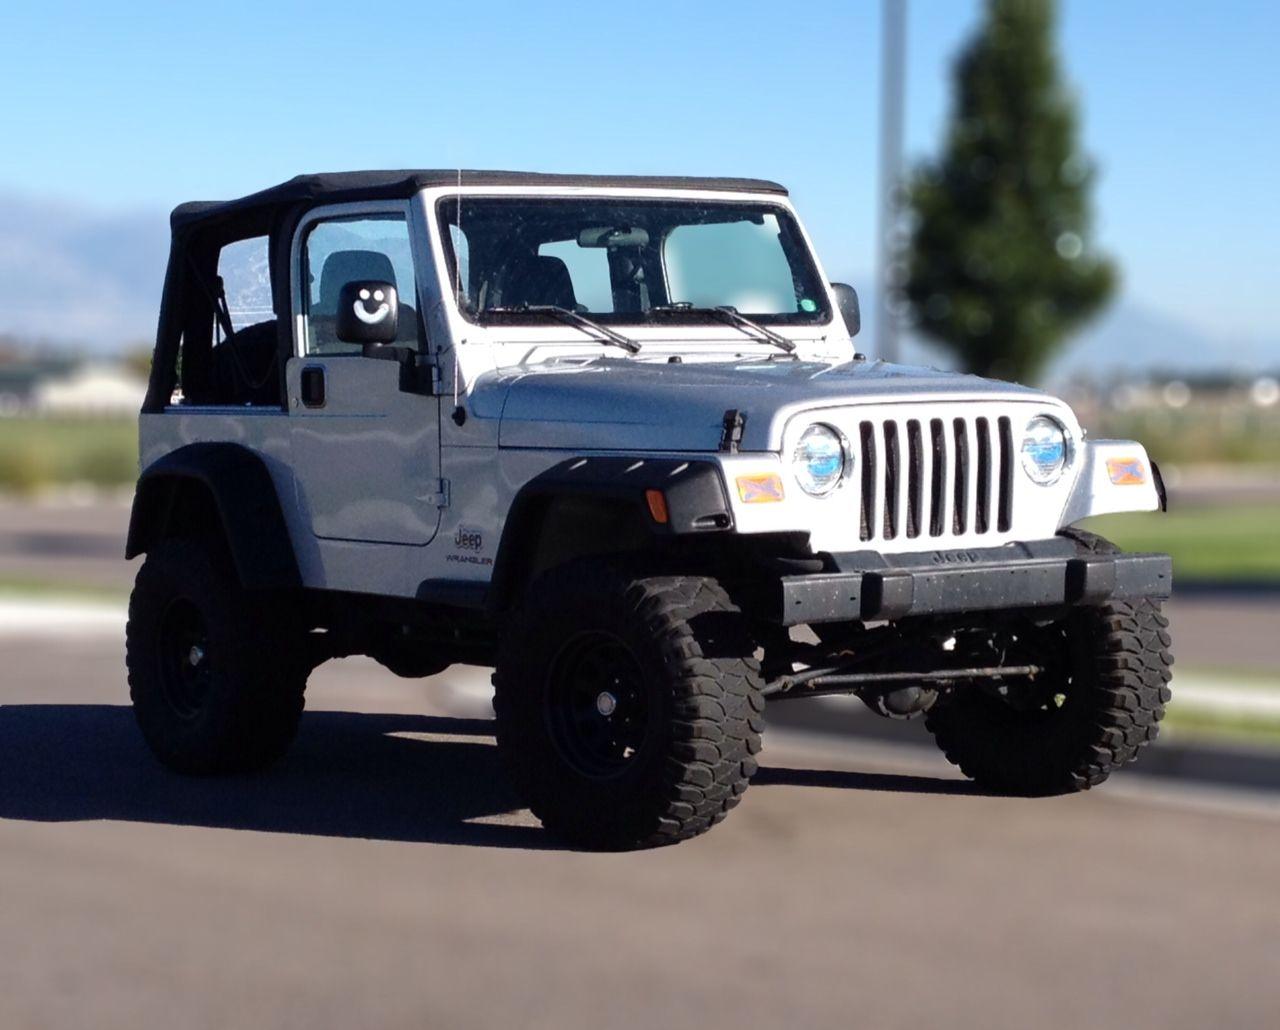 jeep wrangler tj photo gallery | jeep wrangler tj, wrangler tj and